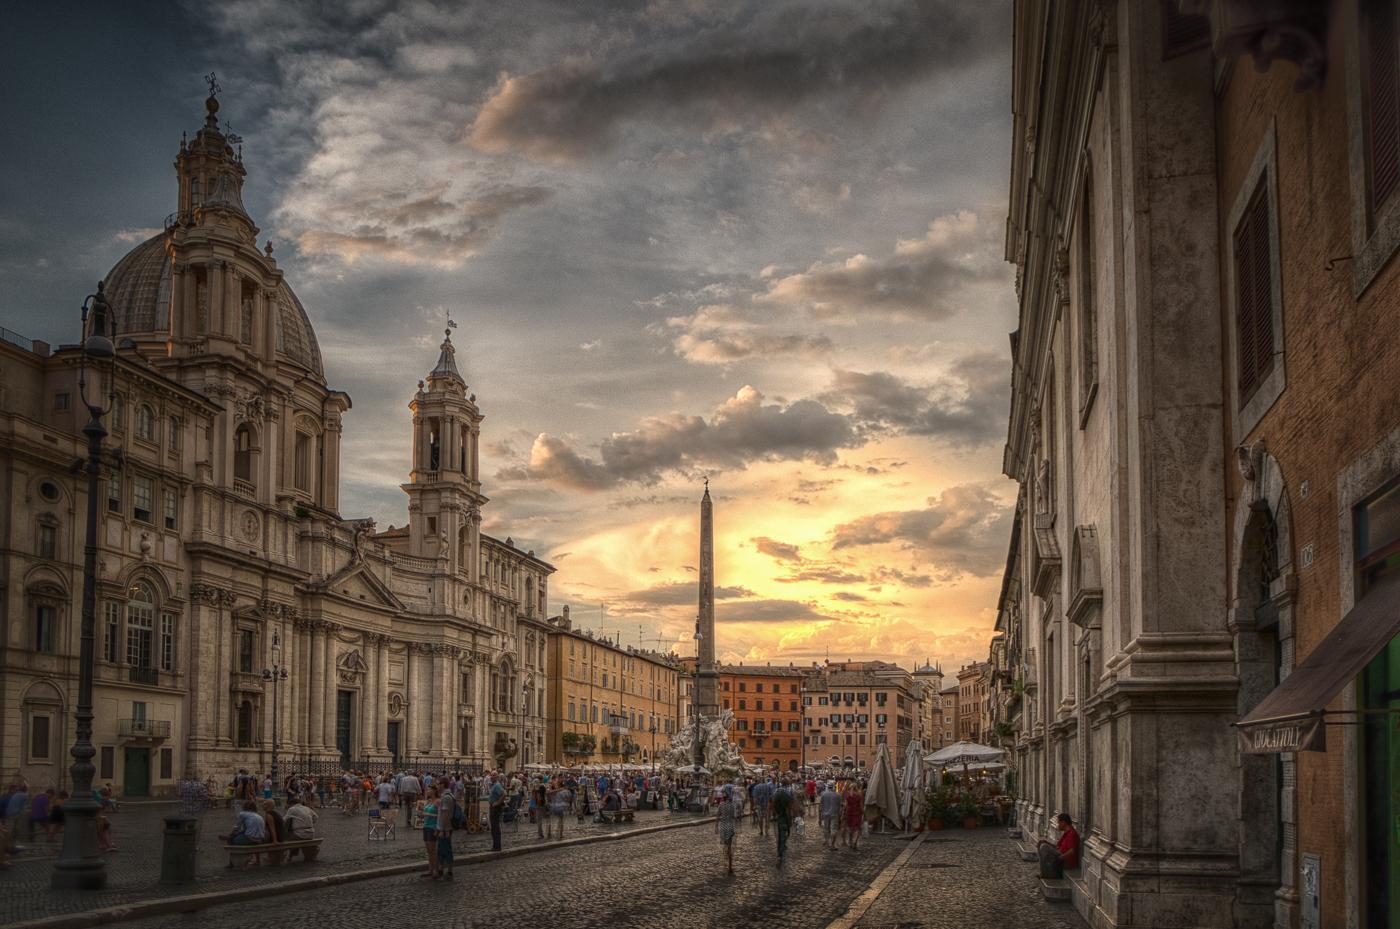 Piazza Navona IV